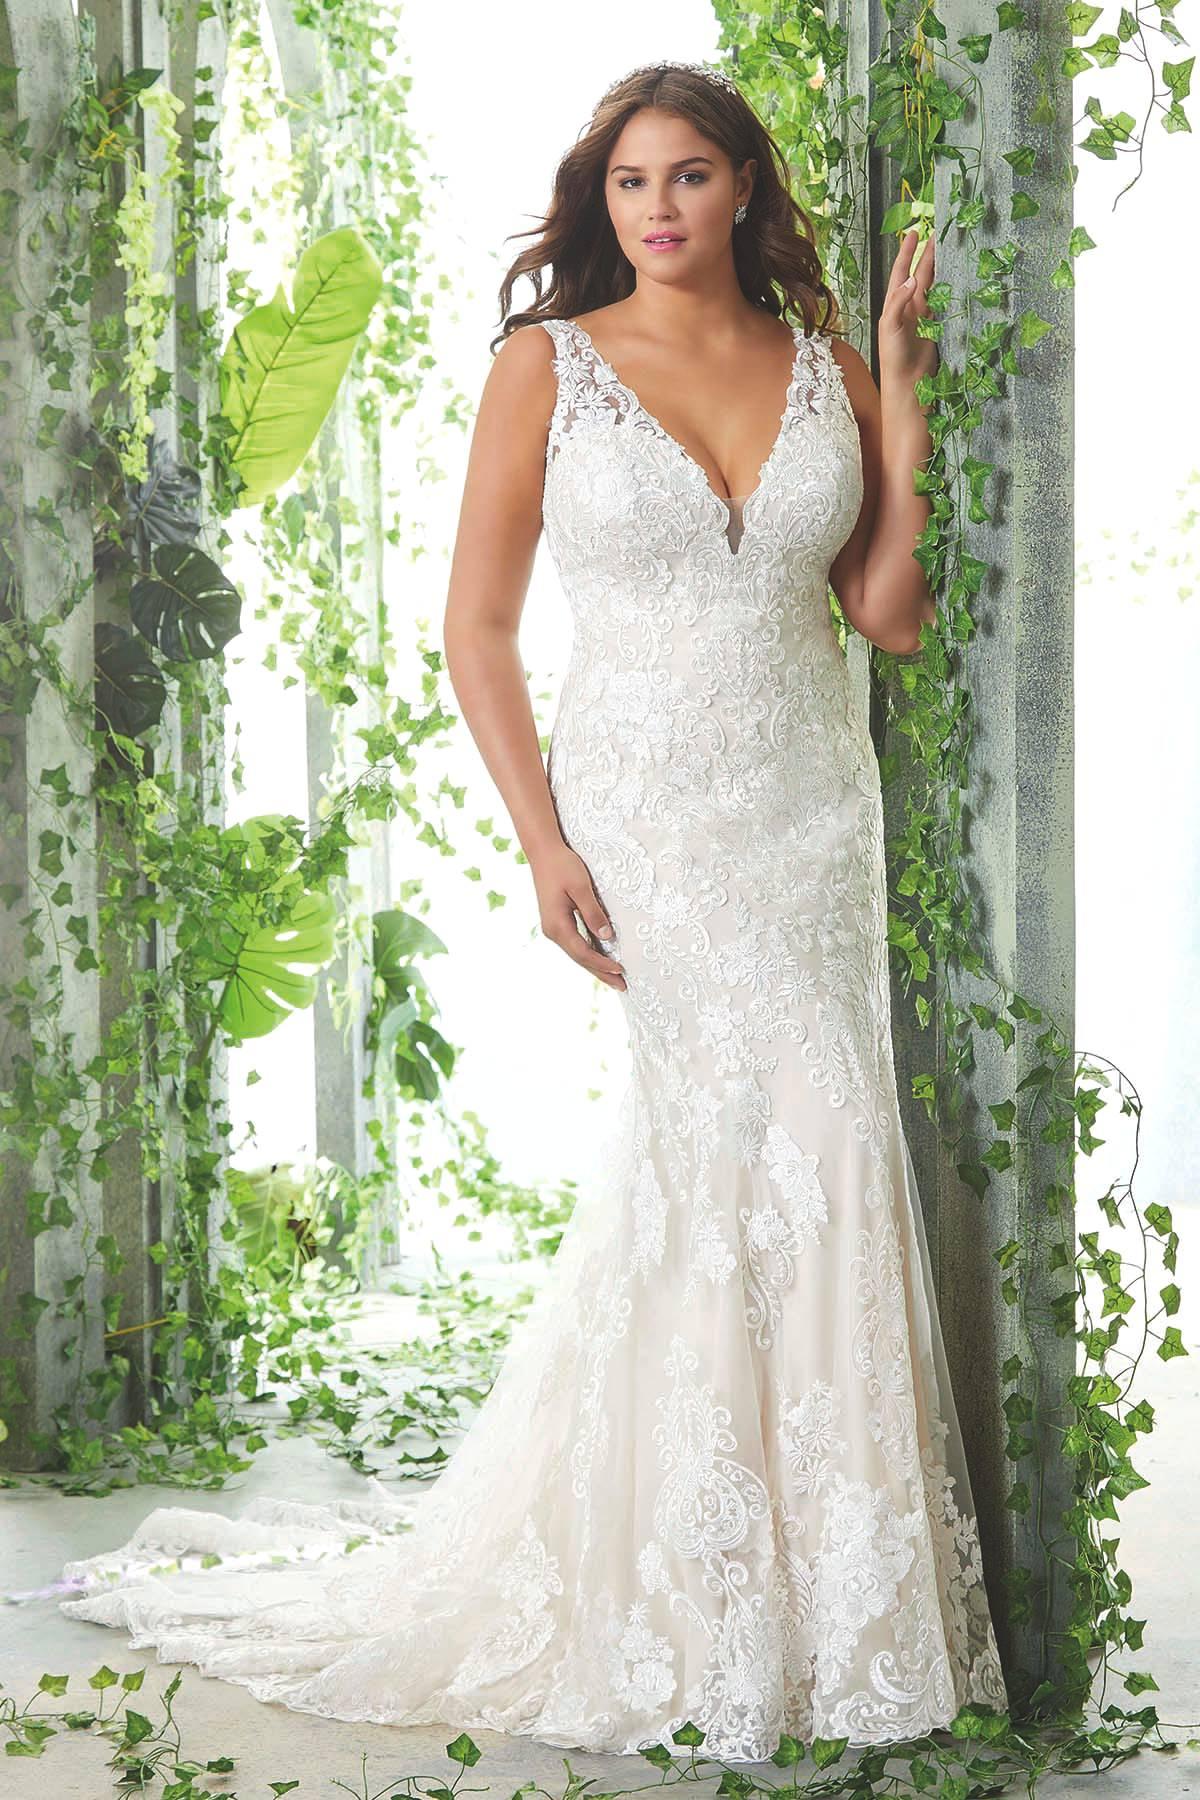 plus-size wedding dresses